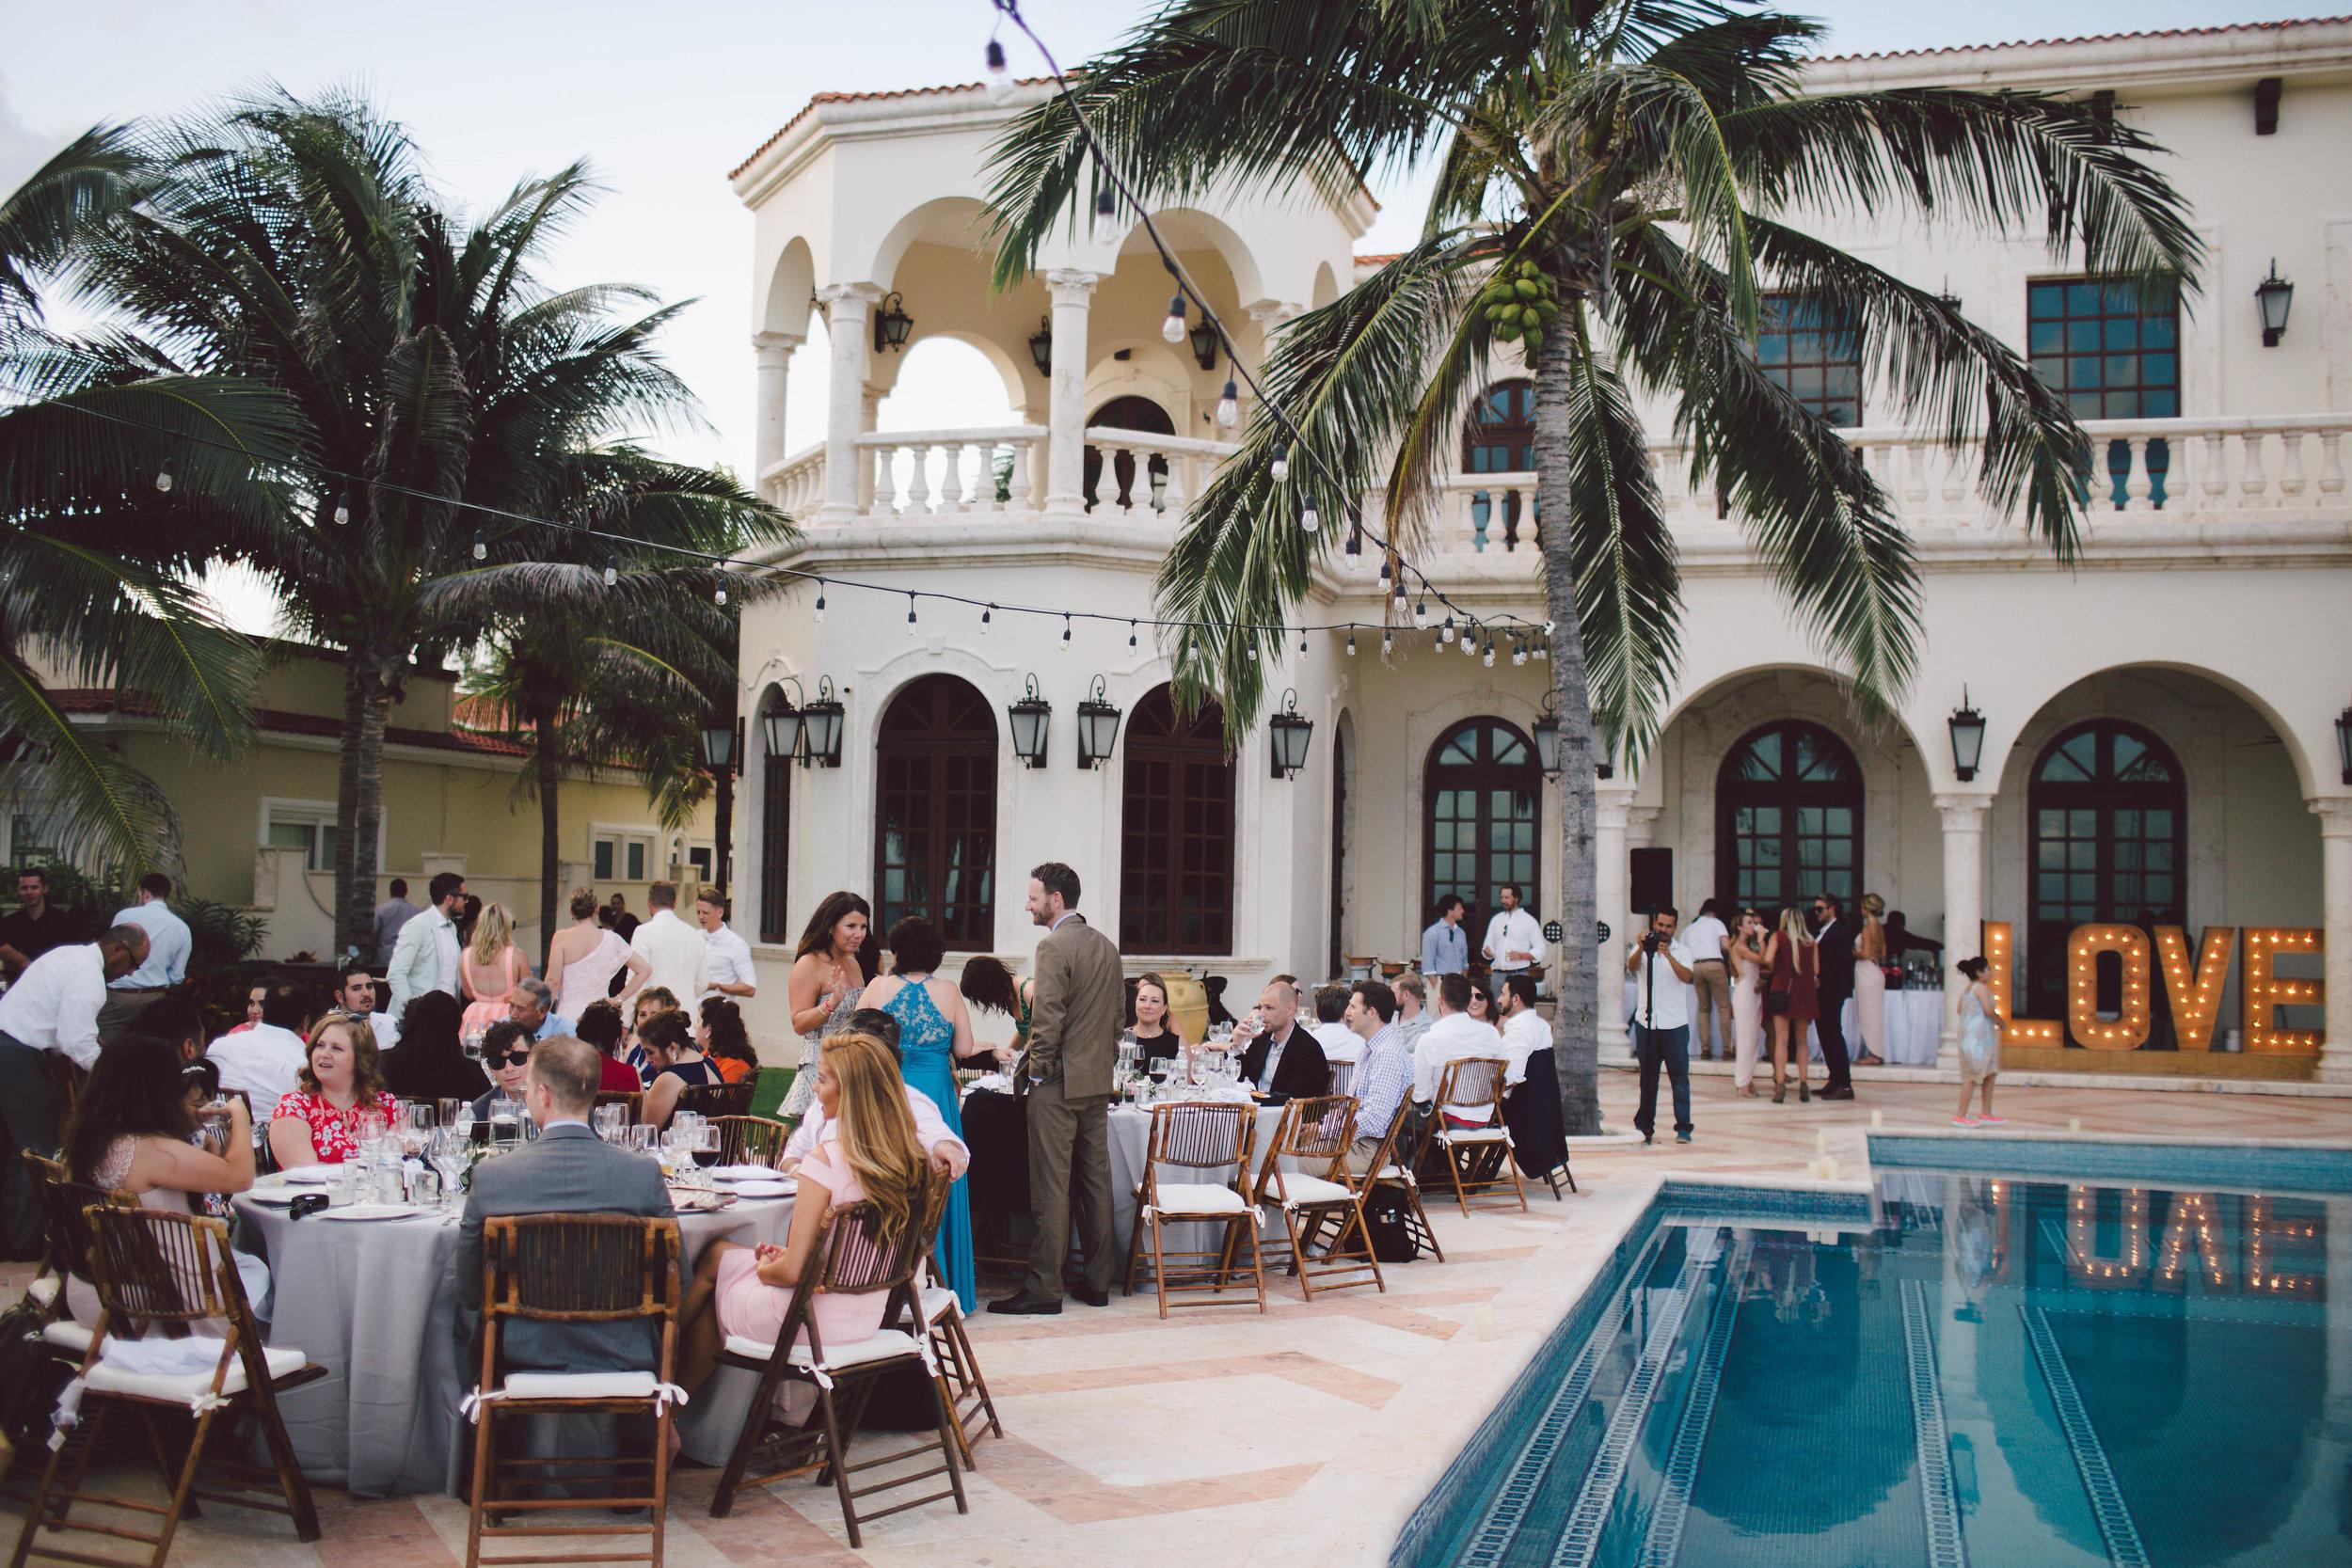 mexico_wedding_cancun_villa_la_joya_evangeline_lane_111.jpg